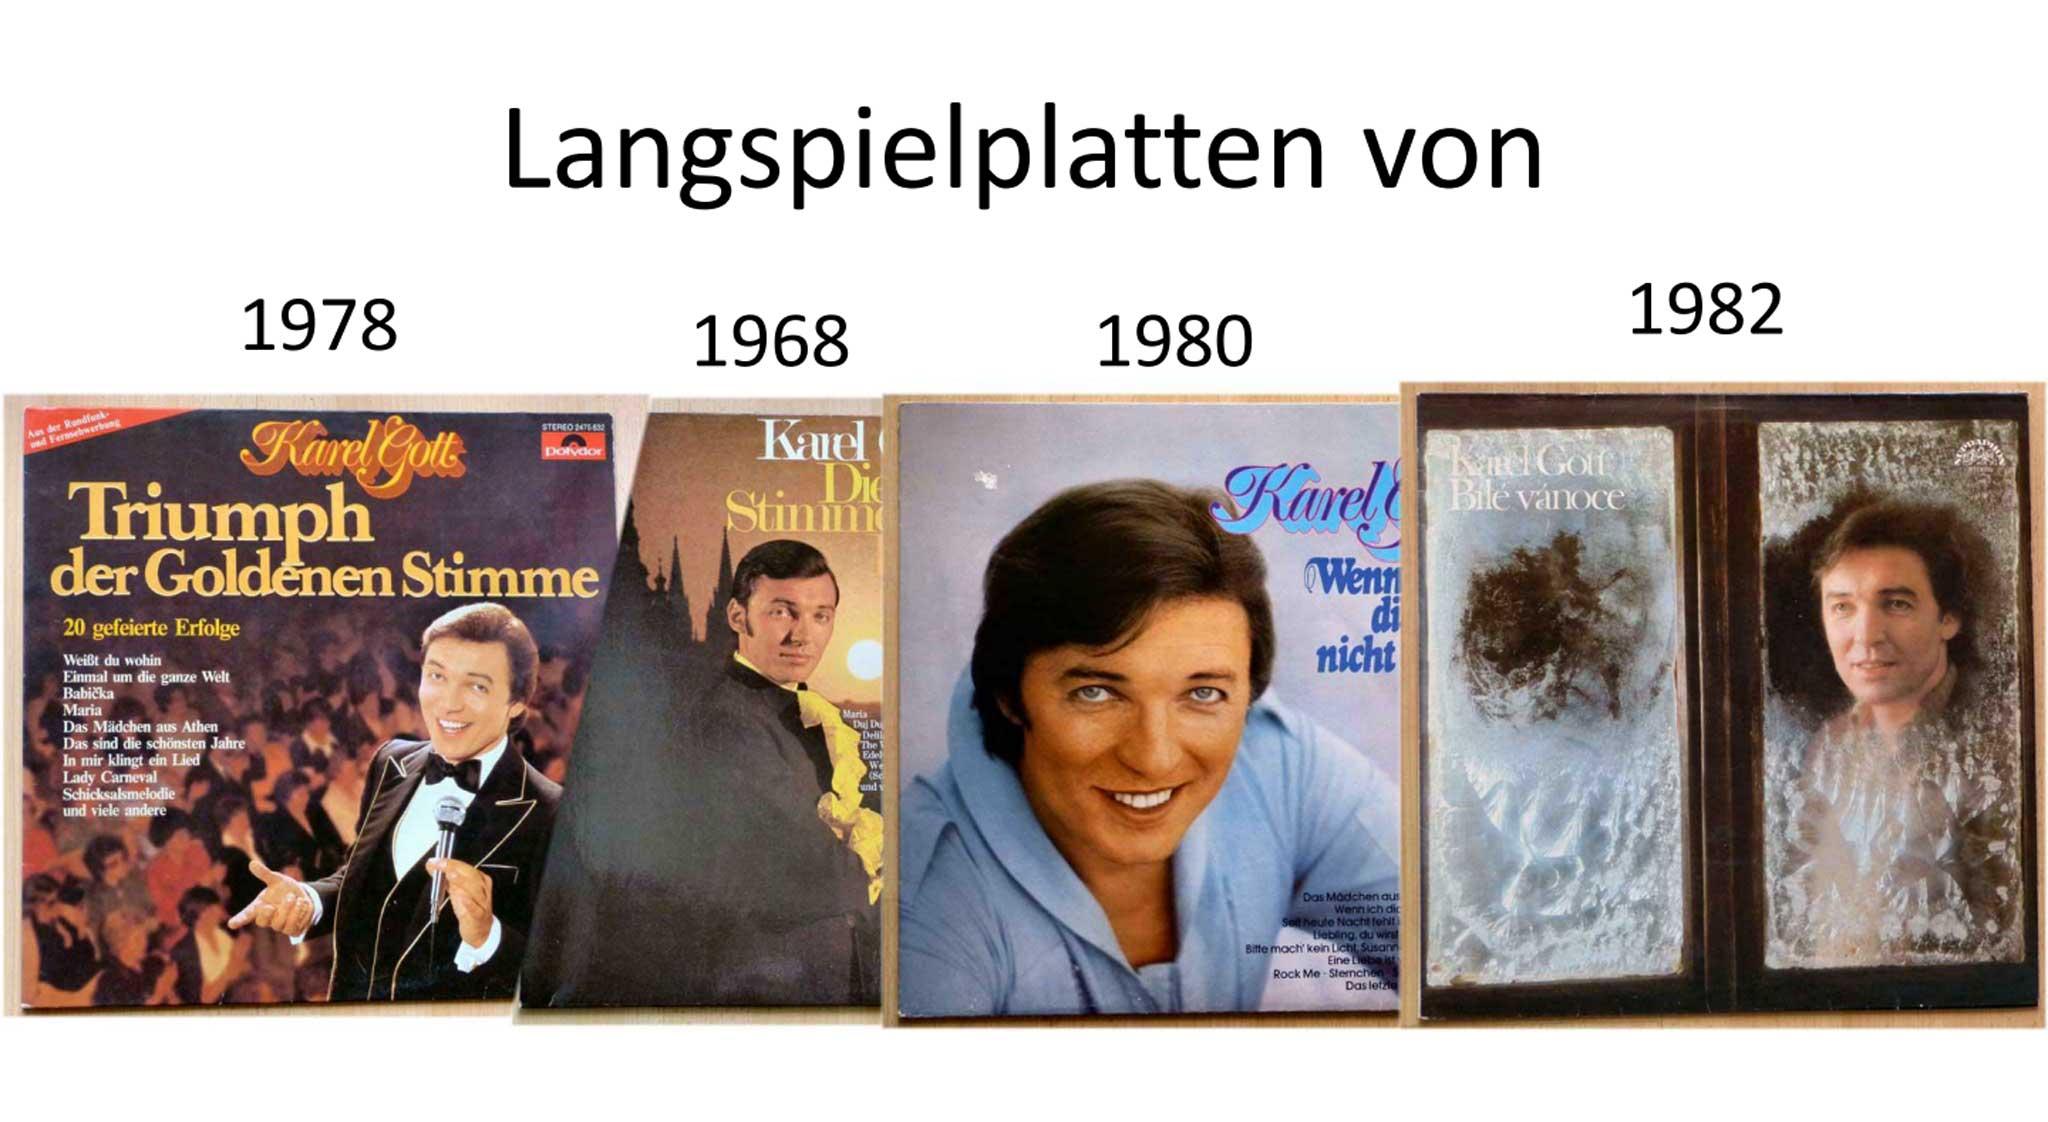 Karel Gott Banner gefeierte Erfolge